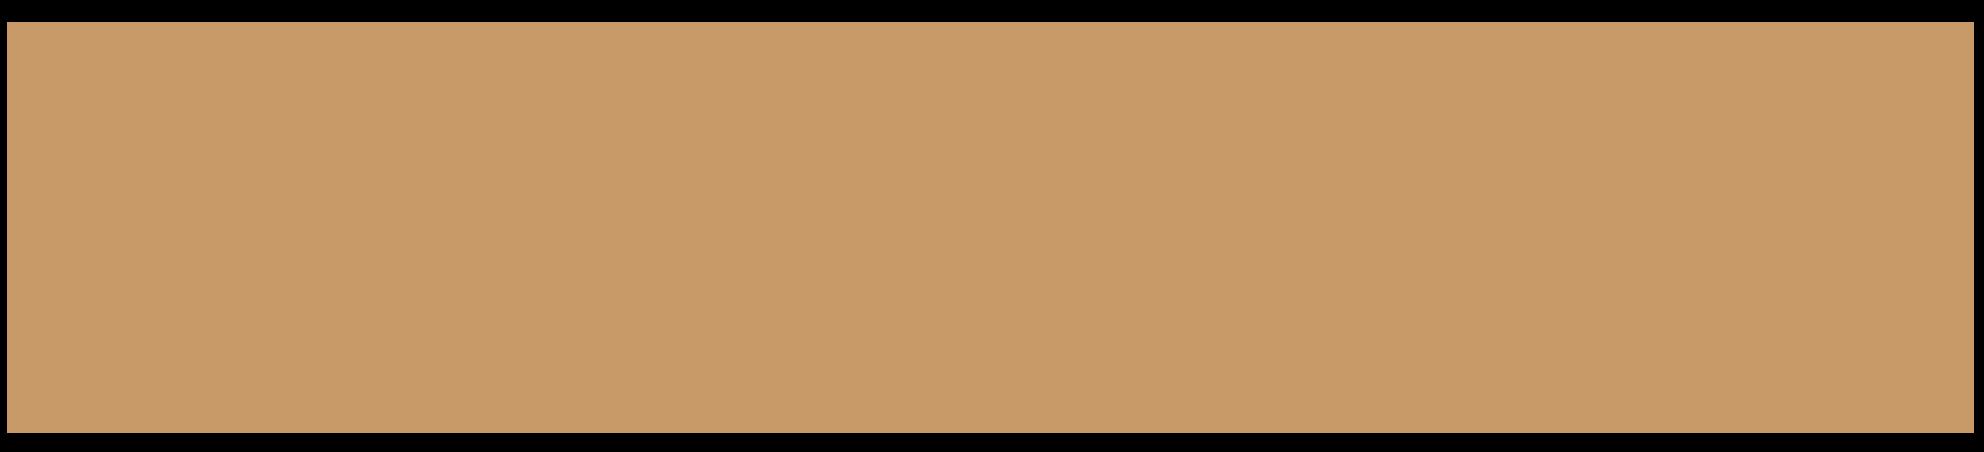 Agathe de Gromard - Avocat Bordeaux